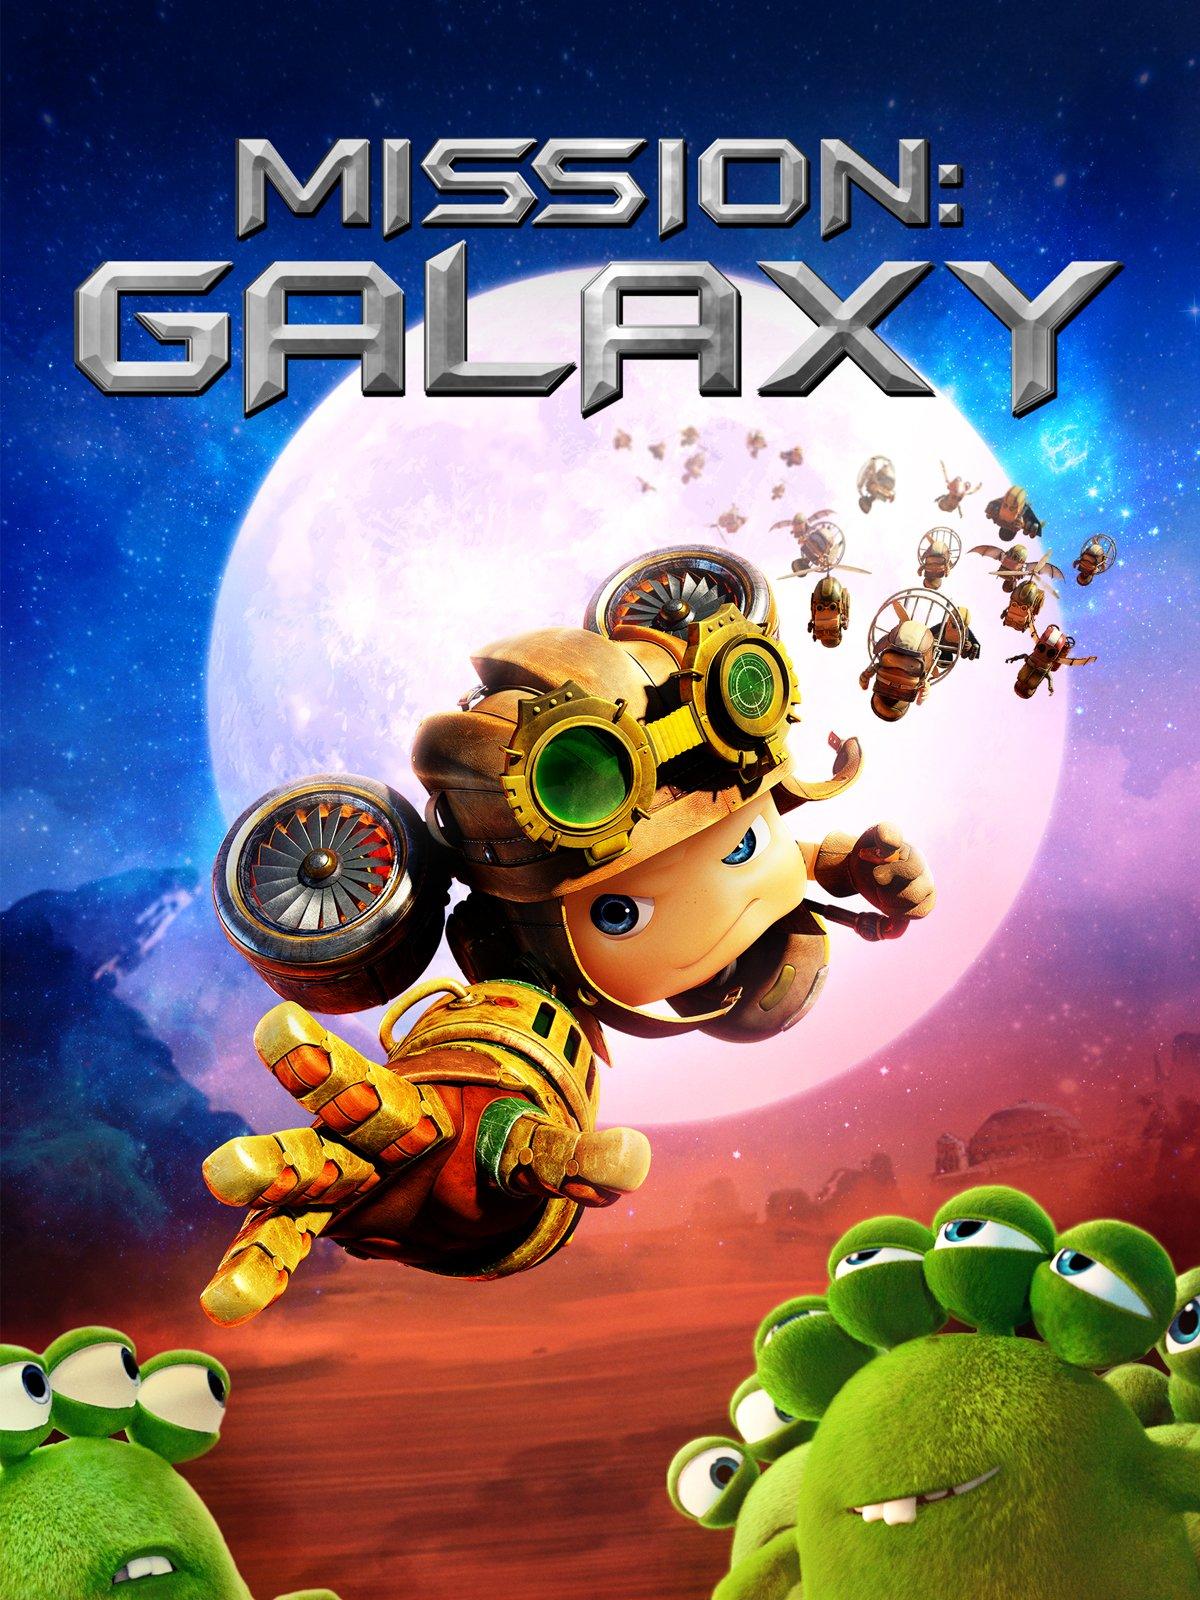 Mission Galaxy (Signature Entertainment) Artwork